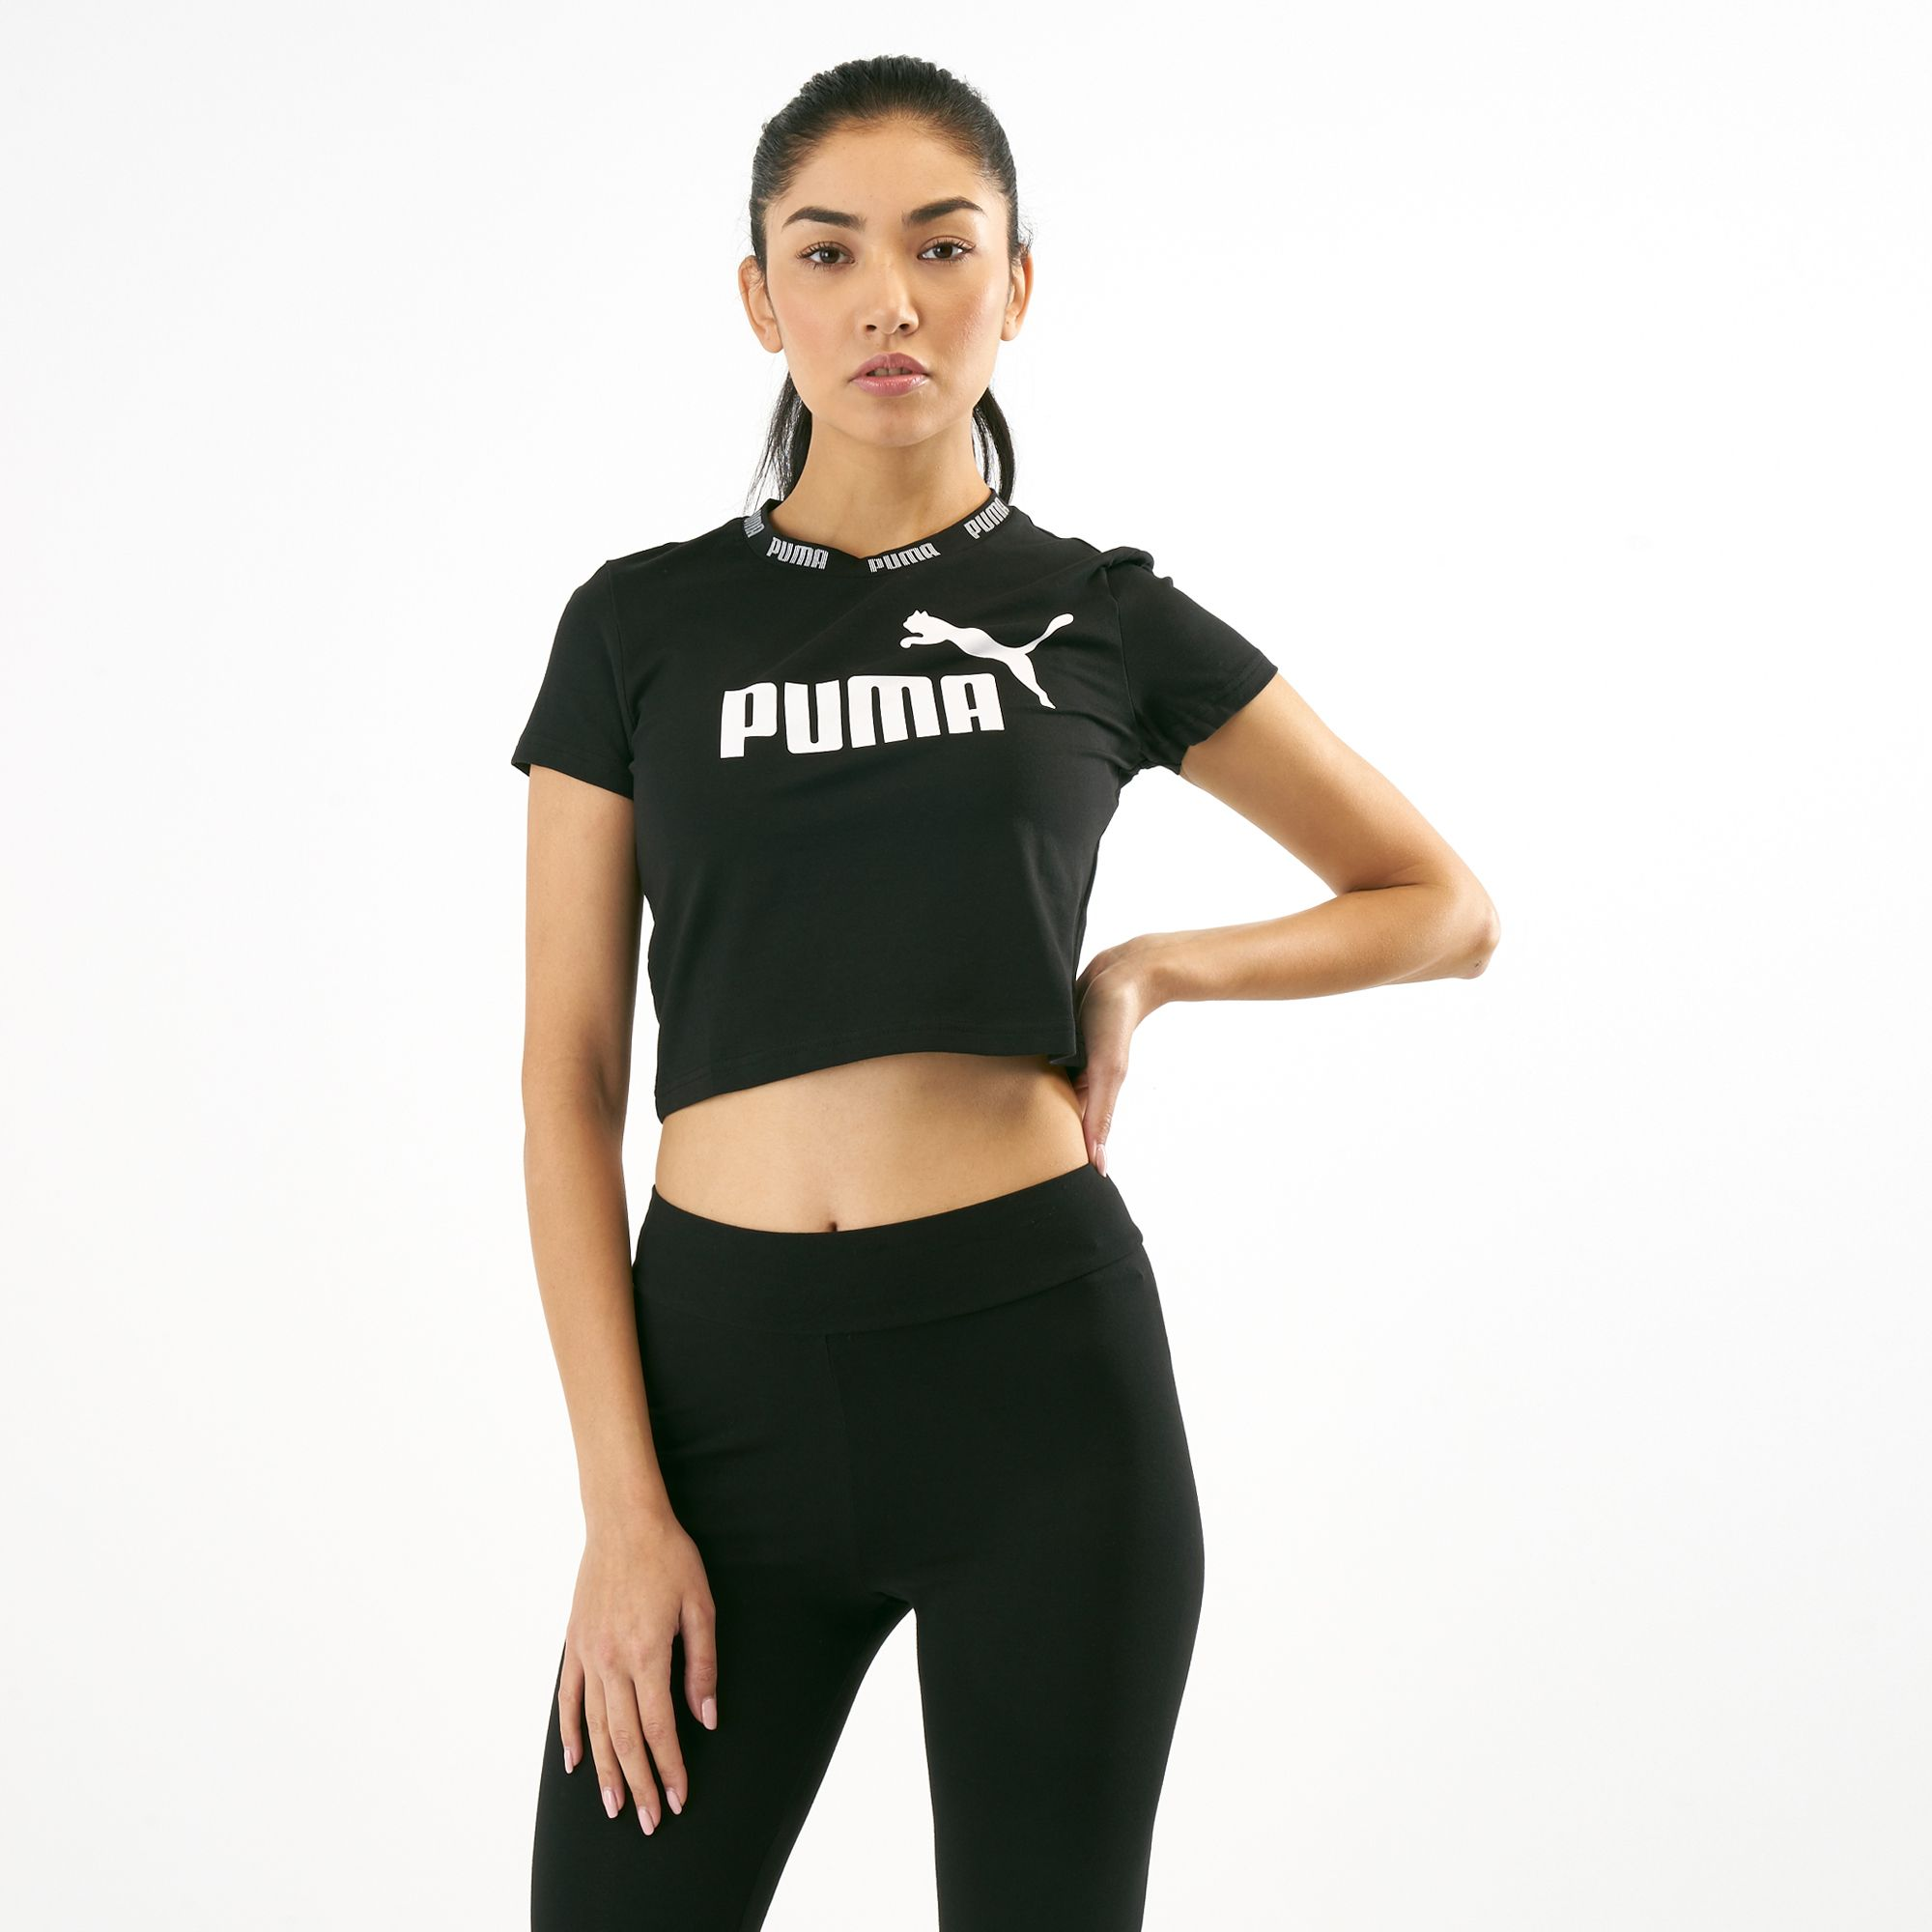 9de7ac449f0 PUMA Women's Amplified Cropped T-Shirt   Tank Tops   Tops   Clothing    Women's Sale   KSA Sale   SSS